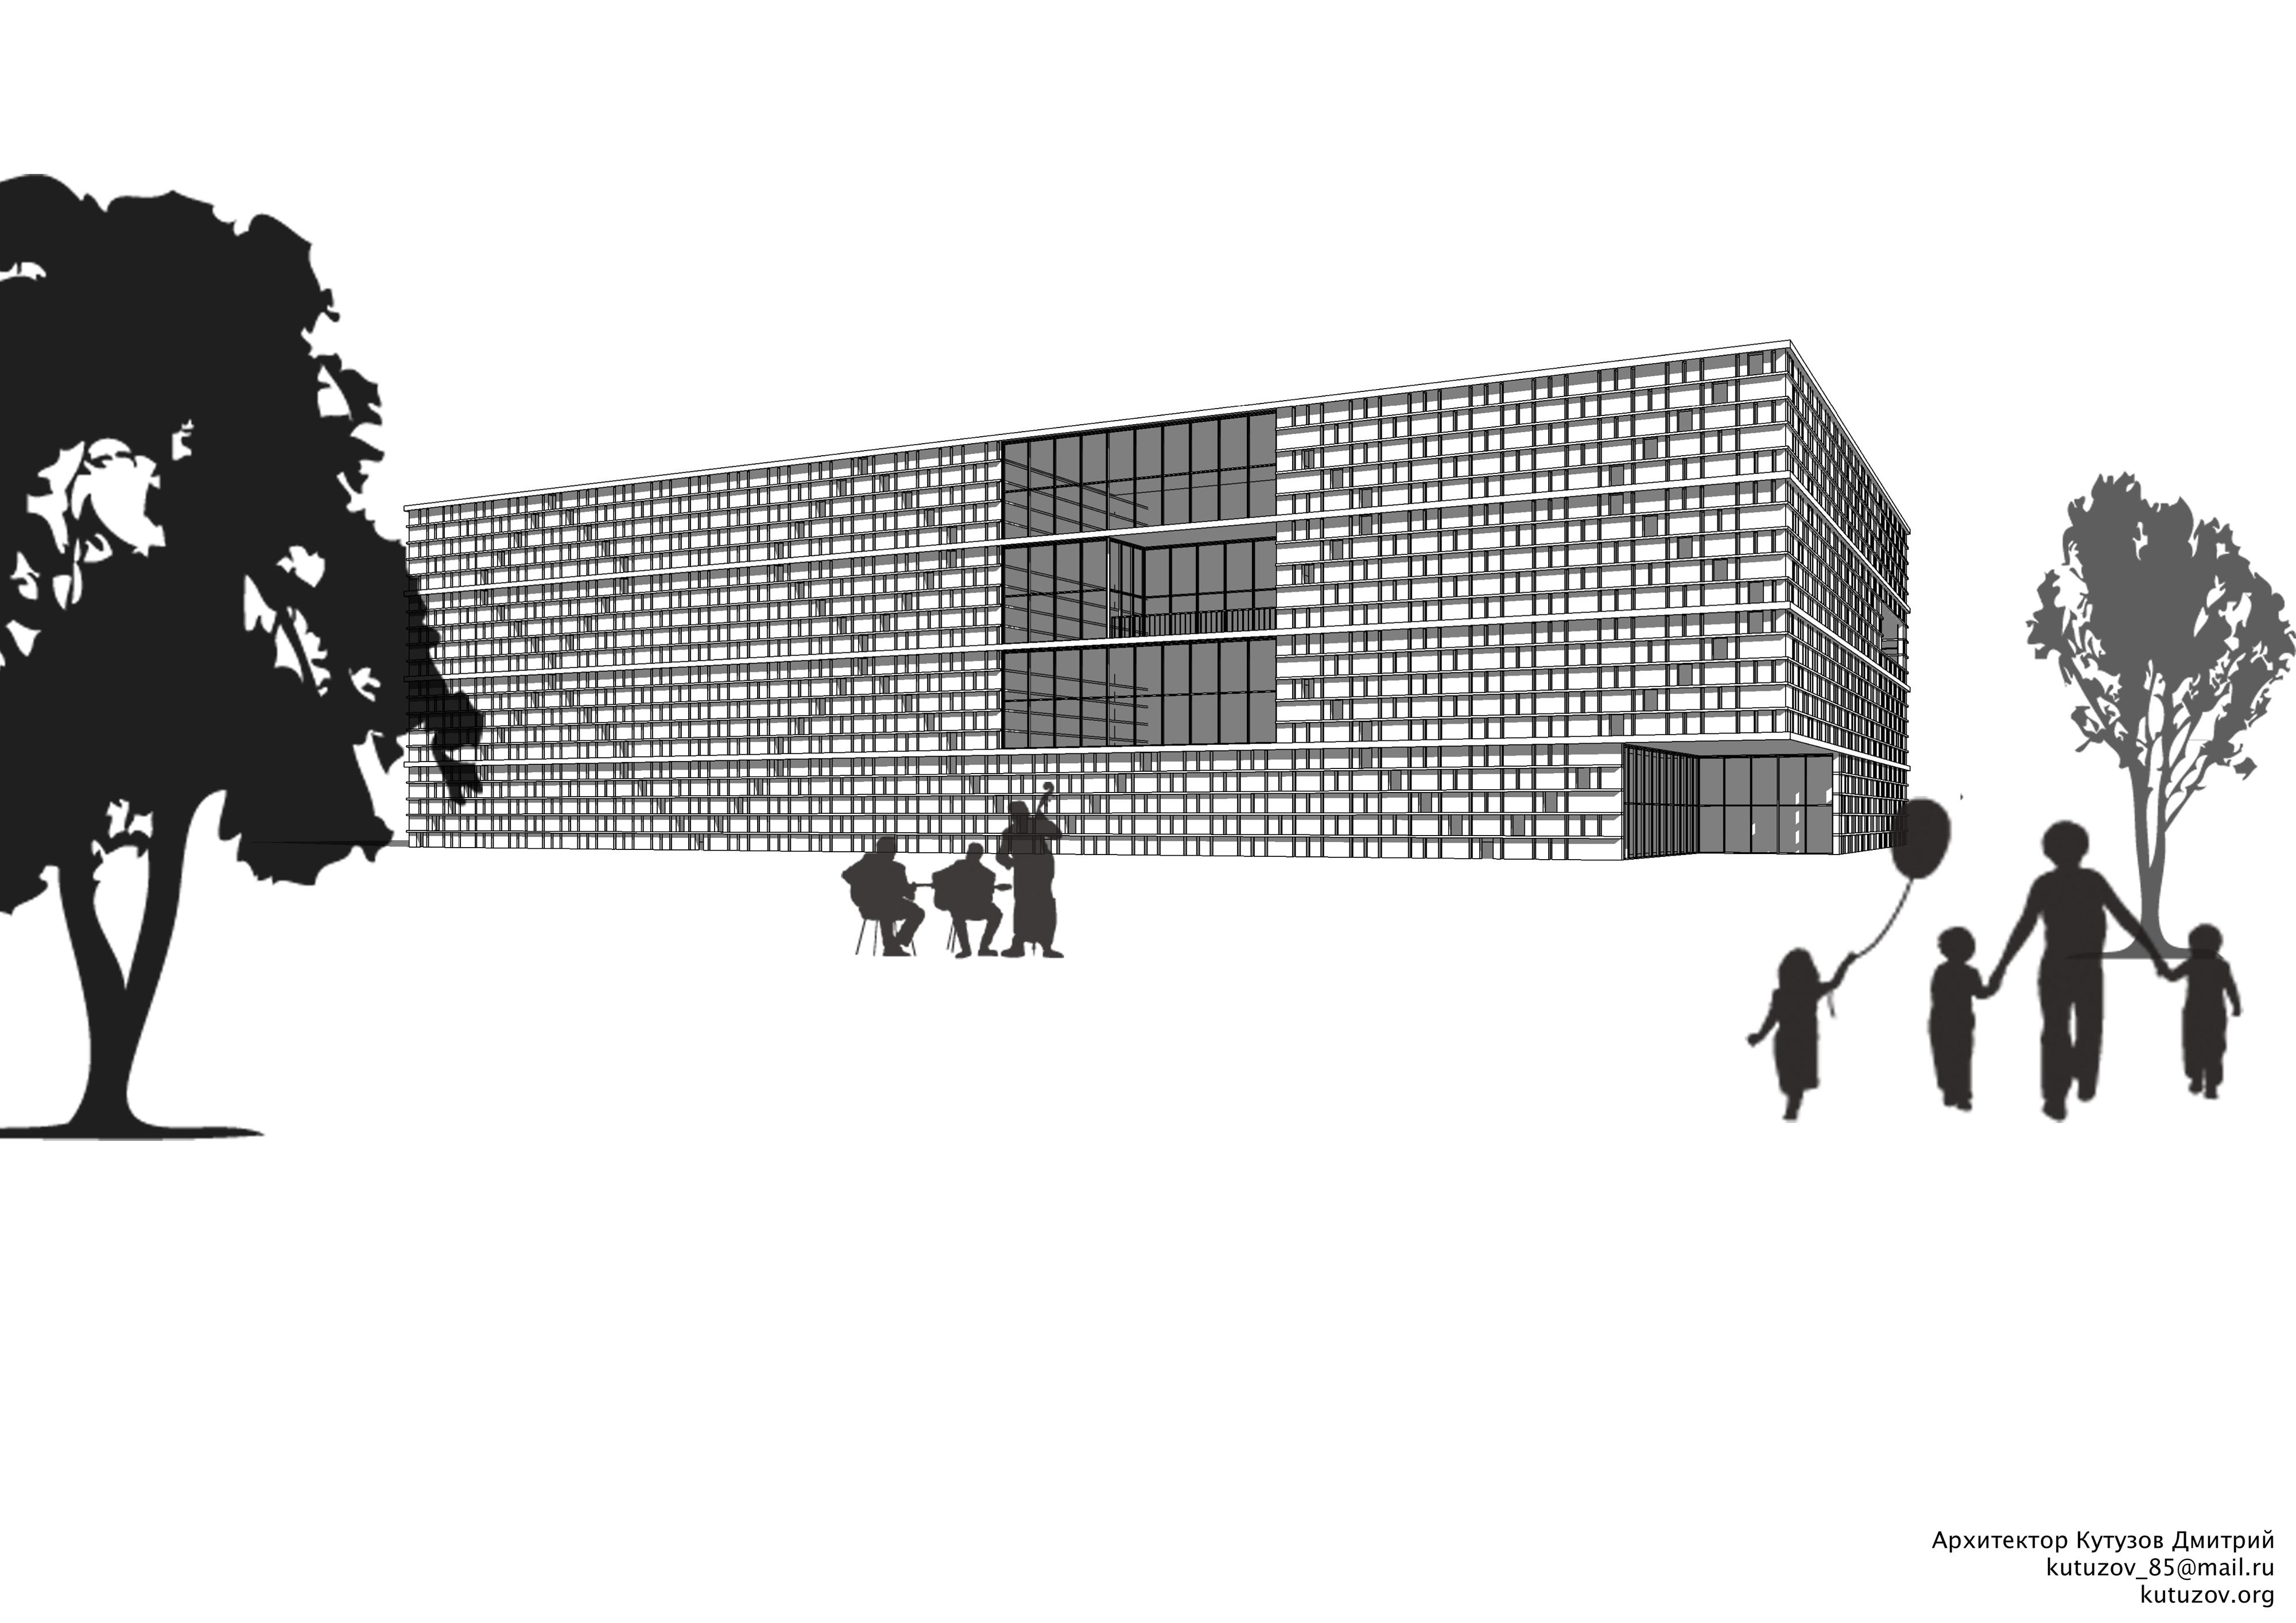 Разработка архитектурной концепции театра оперы и балета фото f_12052f4c99328ec8.jpg